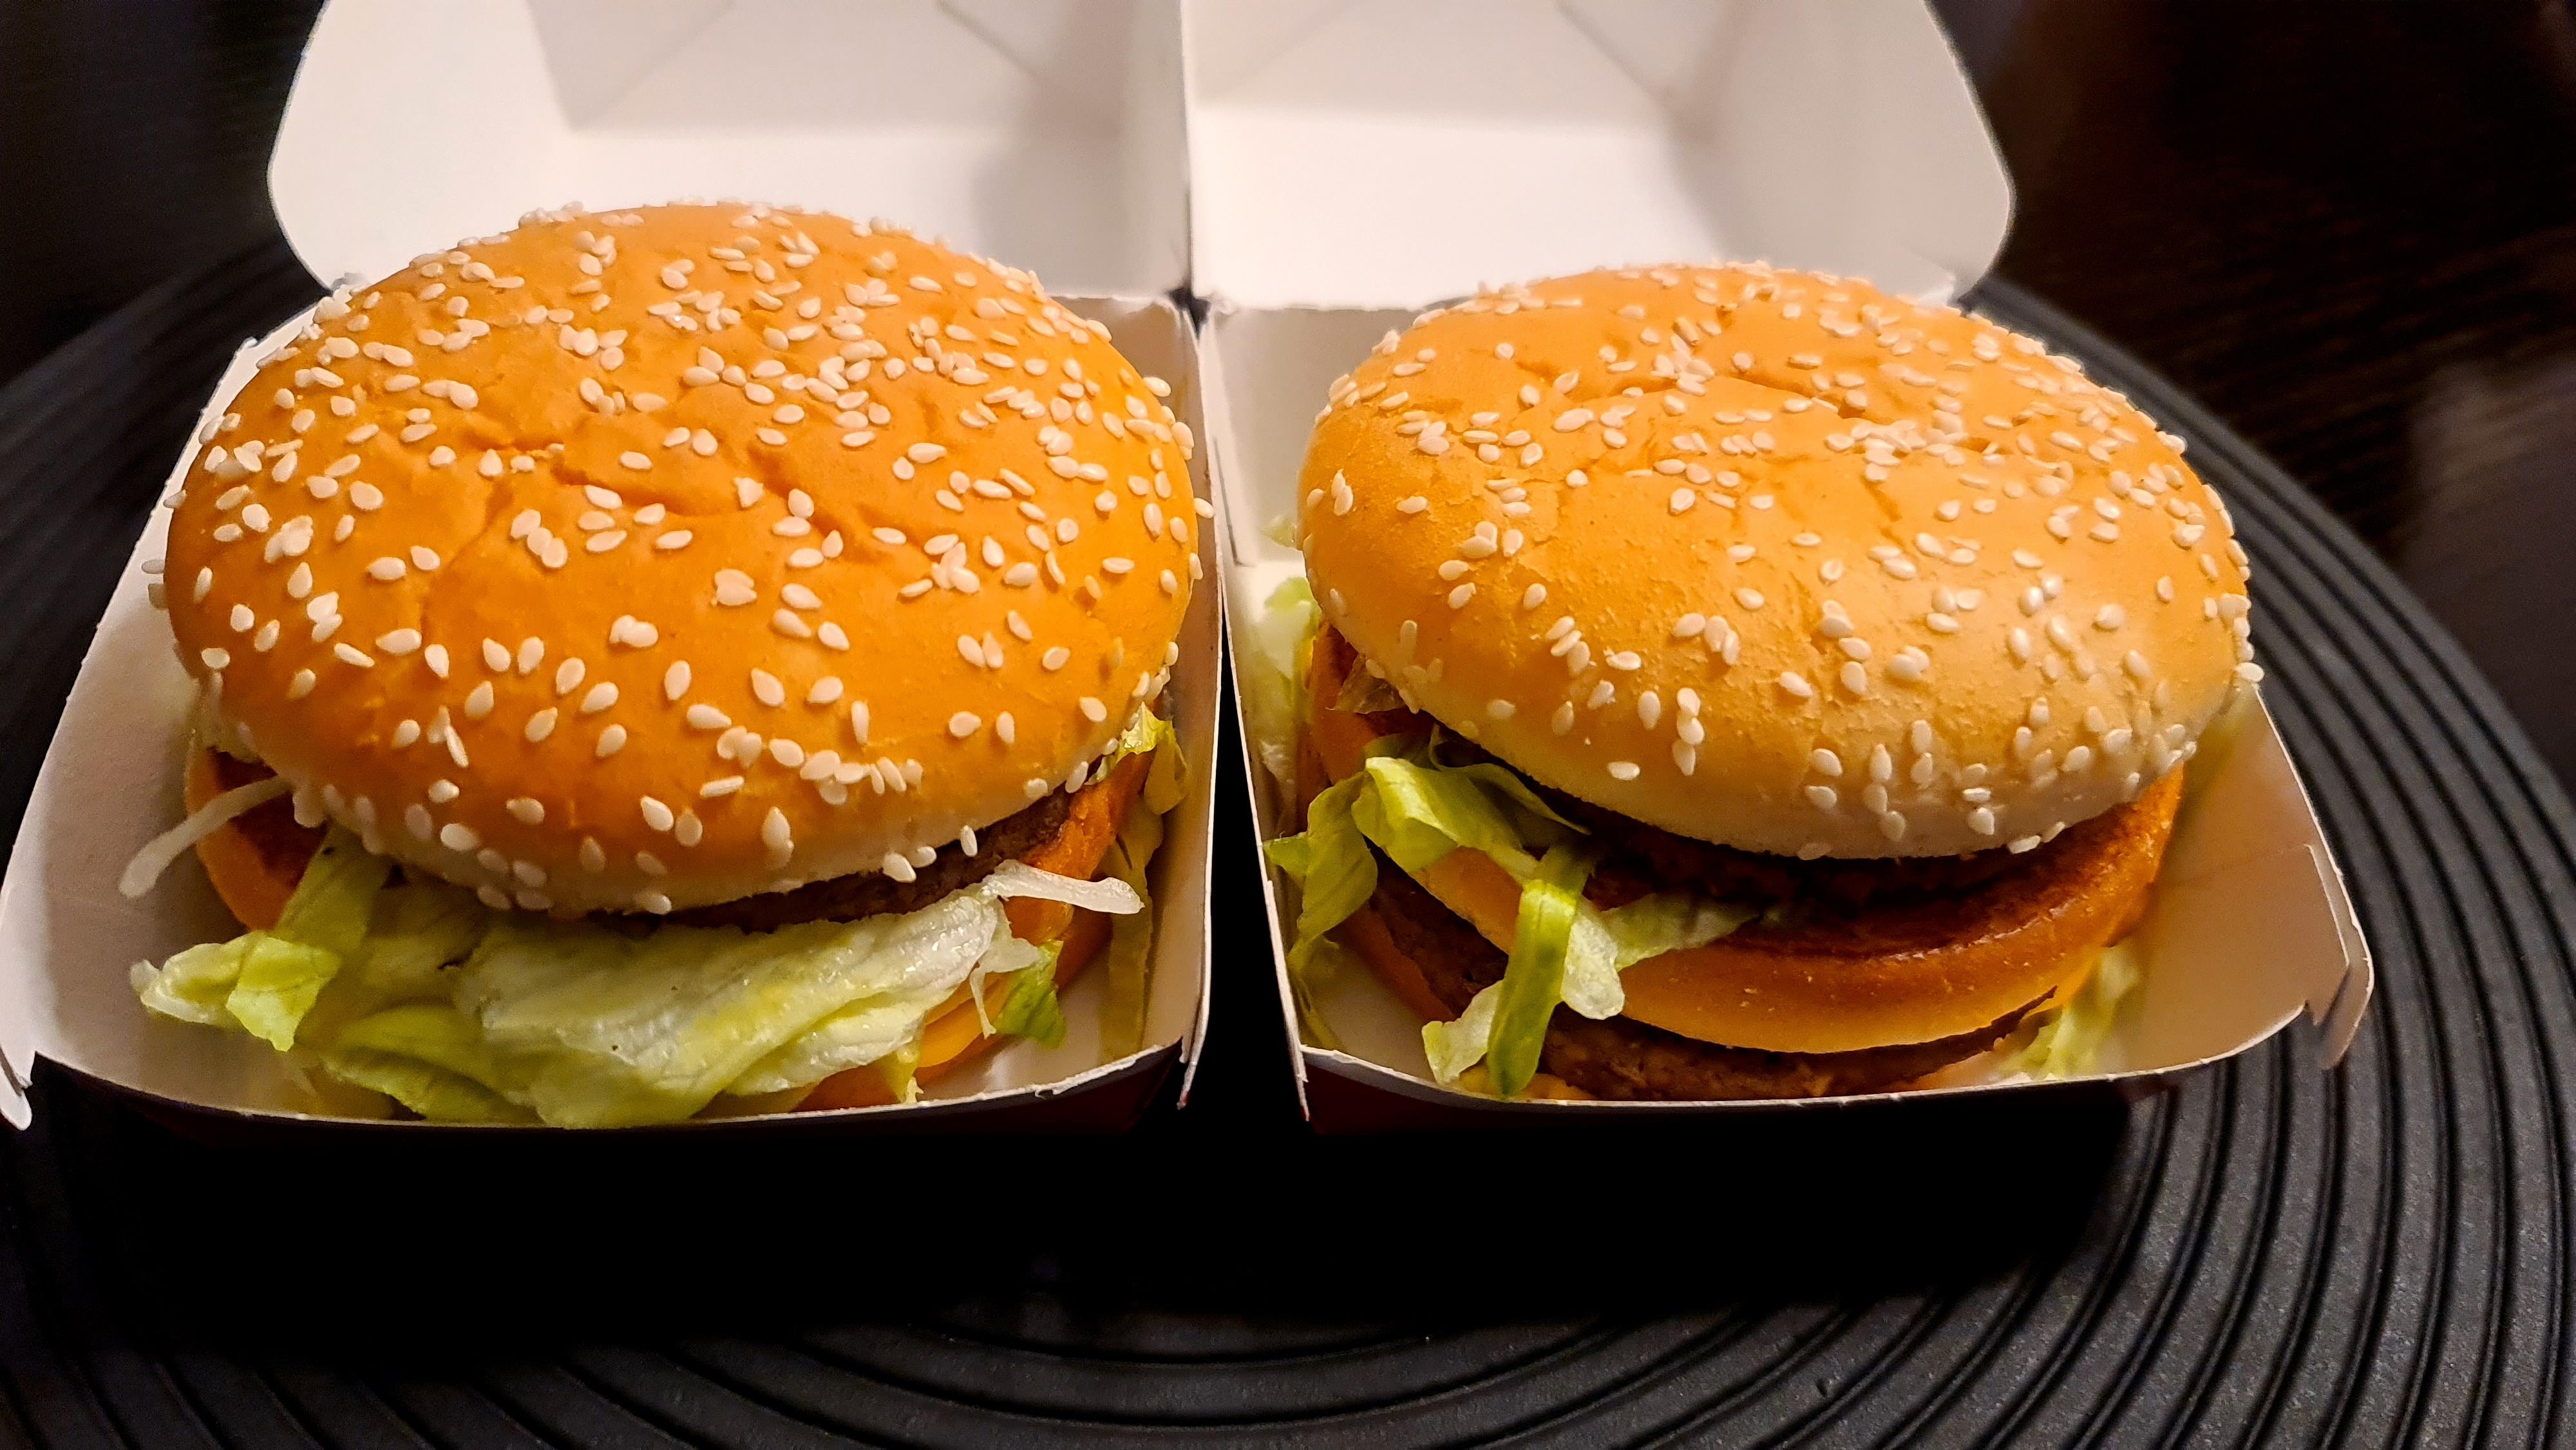 https://foodloader.net/Holz_2020-10-14_McDonalds.jpg